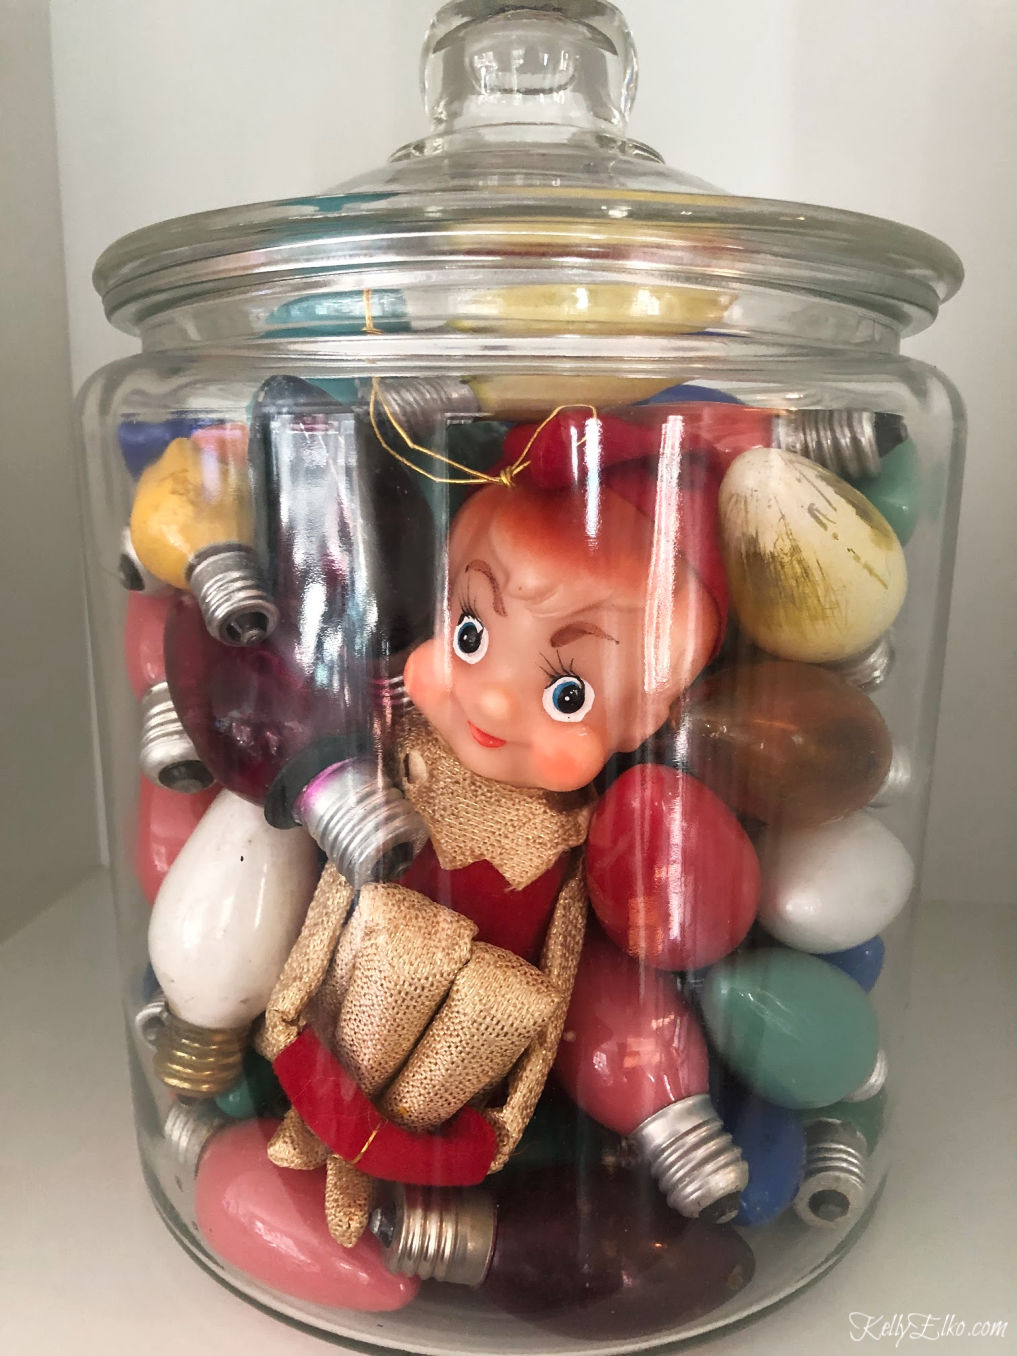 Vintage Knee Hugger kellyelko.com #christmas #vintagechristmas #vintage #collectibles #christmascollectibles #kneehugger #kellyelko